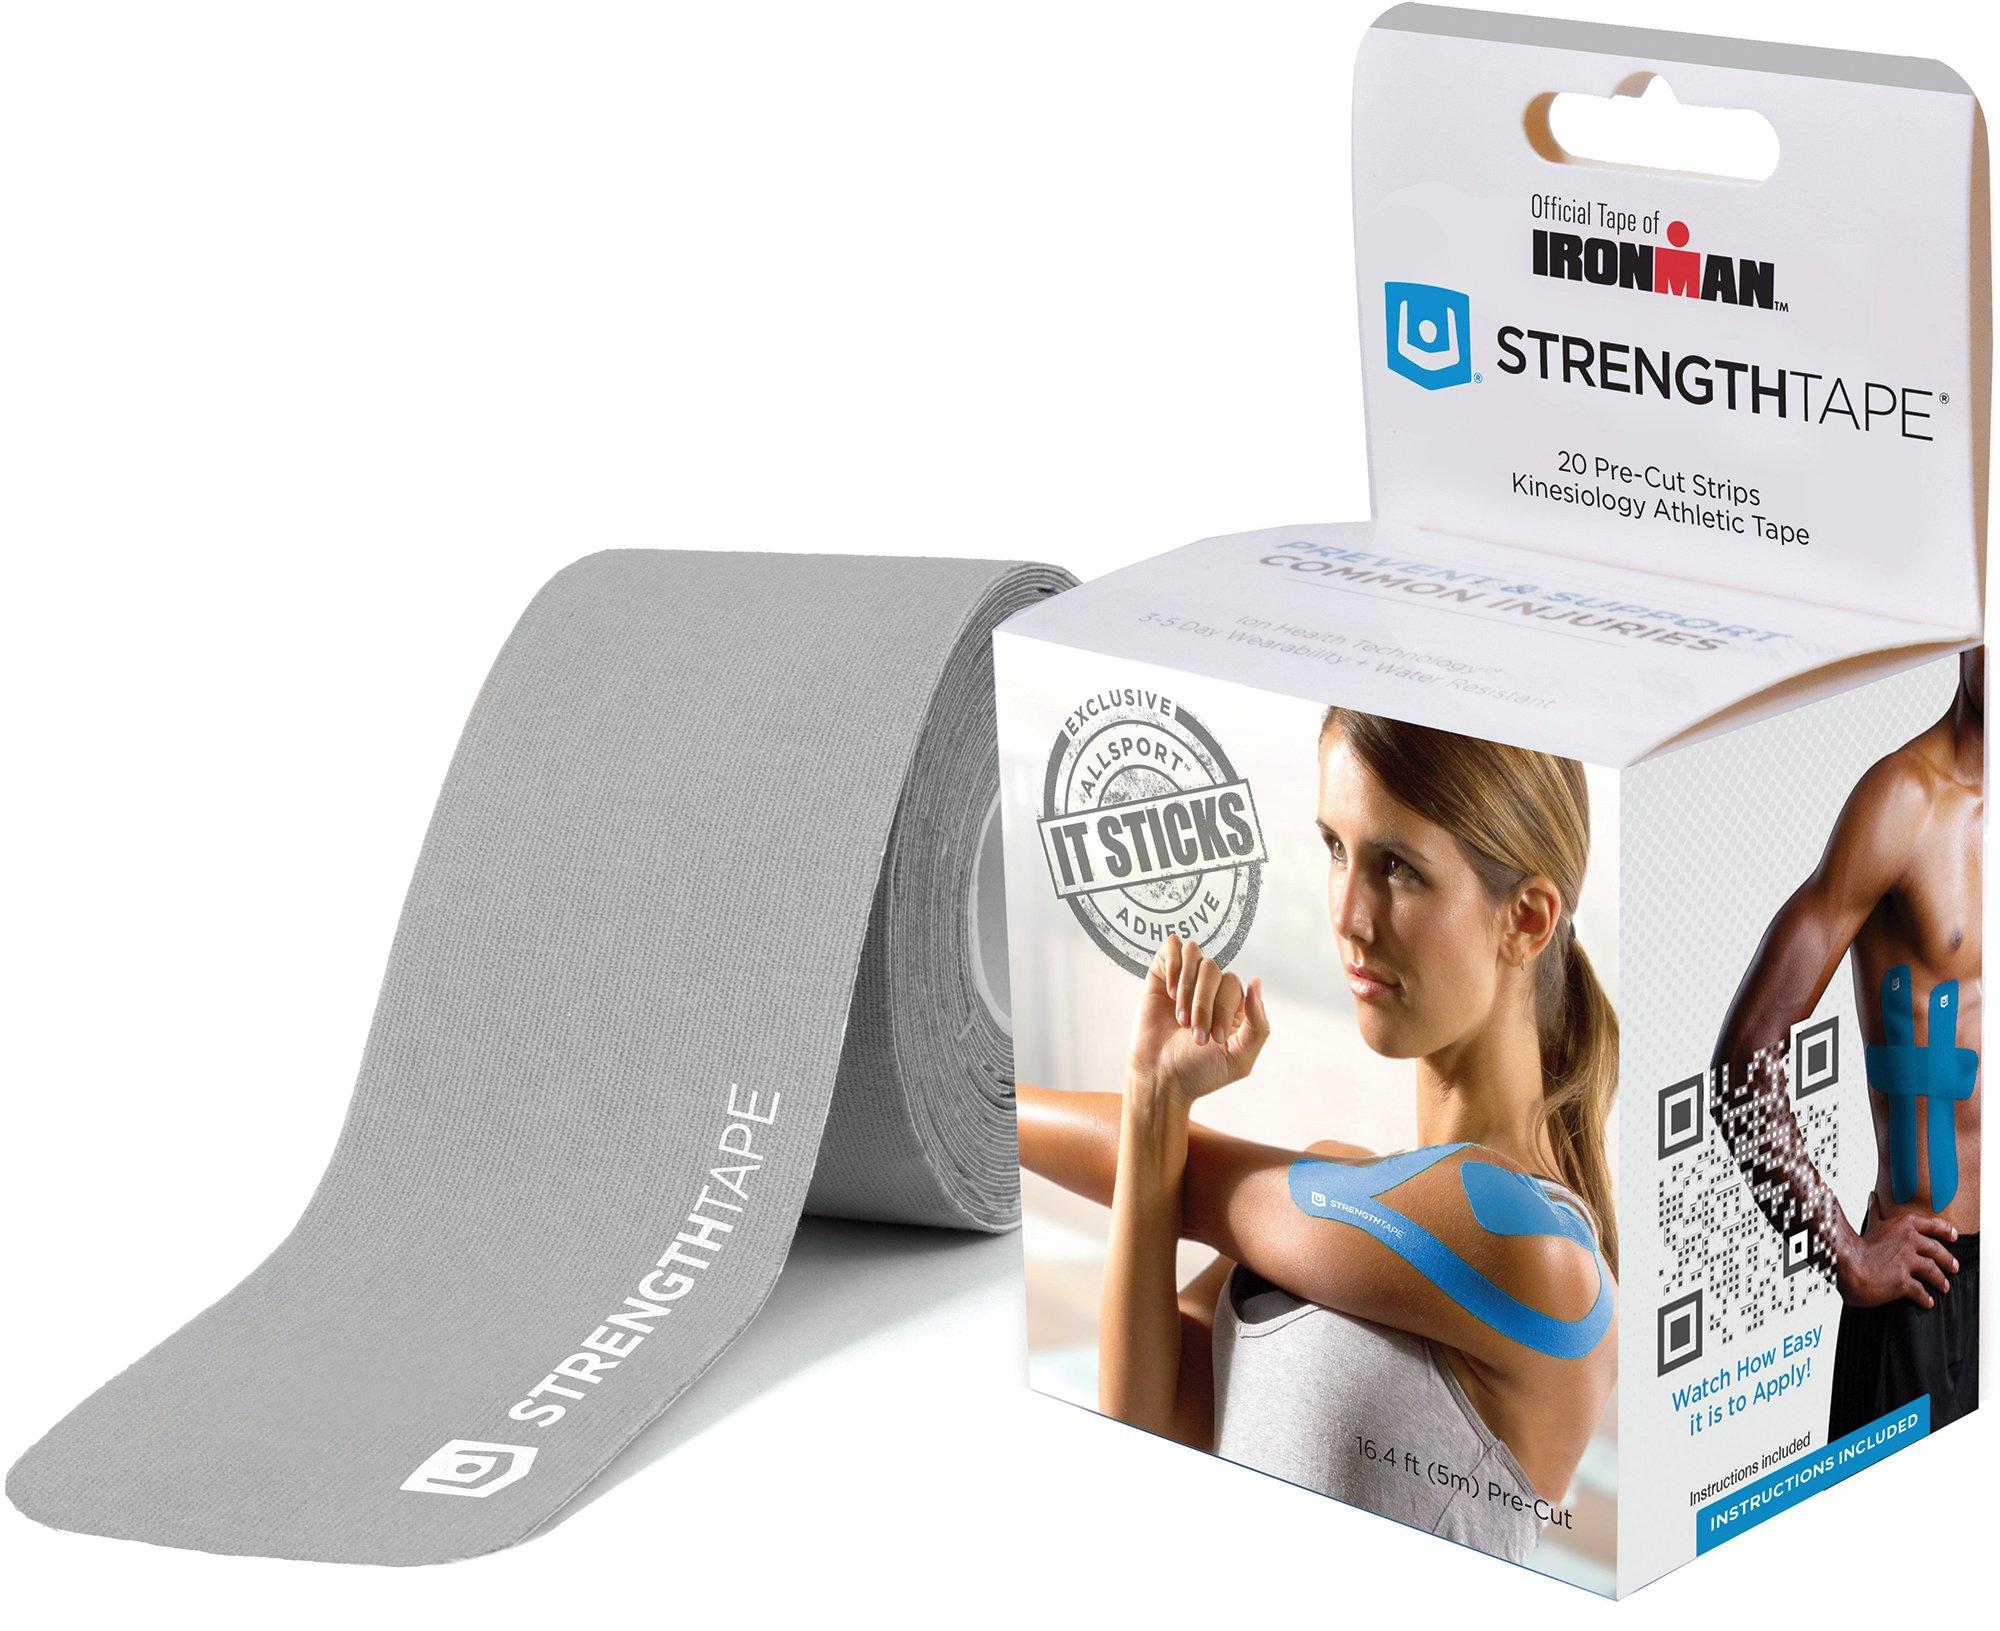 StrengthTape Kinesiology Tape - 16.'(5m) Roll of 10'' Precut Strips - Silver